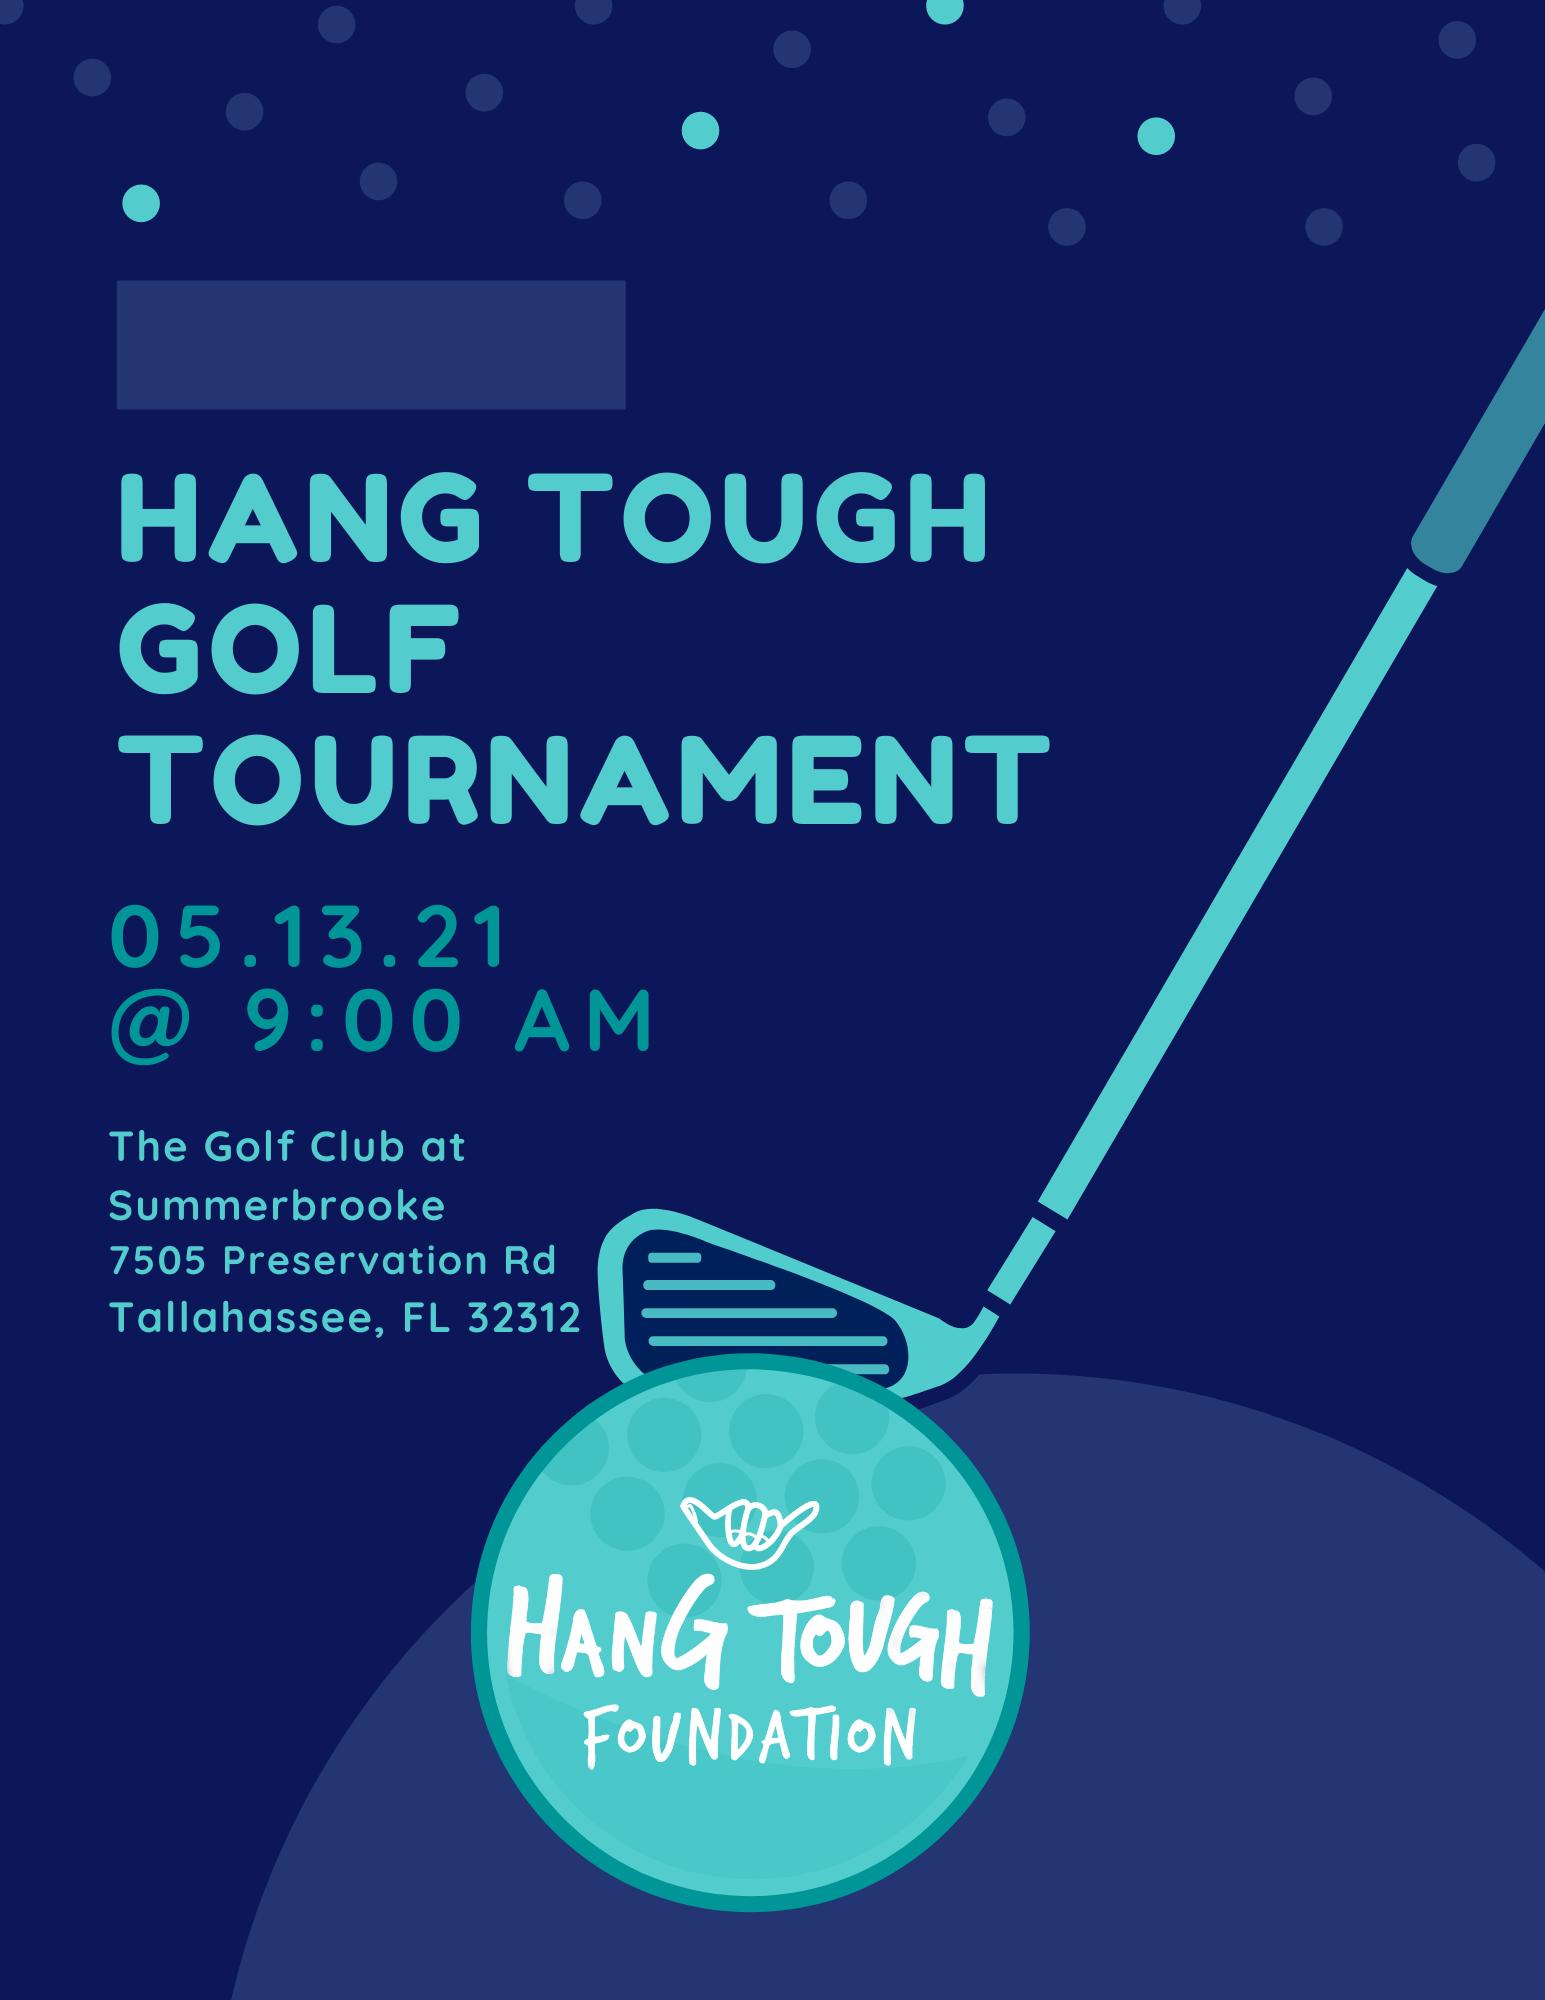 Hang Tough Foundation Golf Tournament